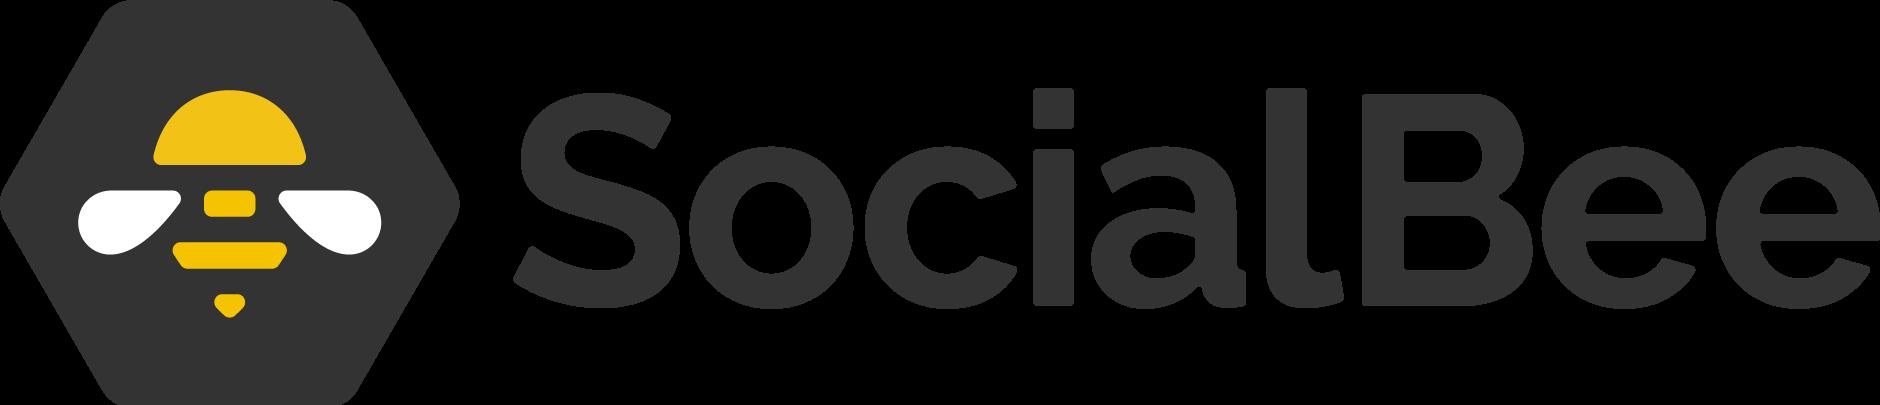 SocialBee- SerbianTech community deals